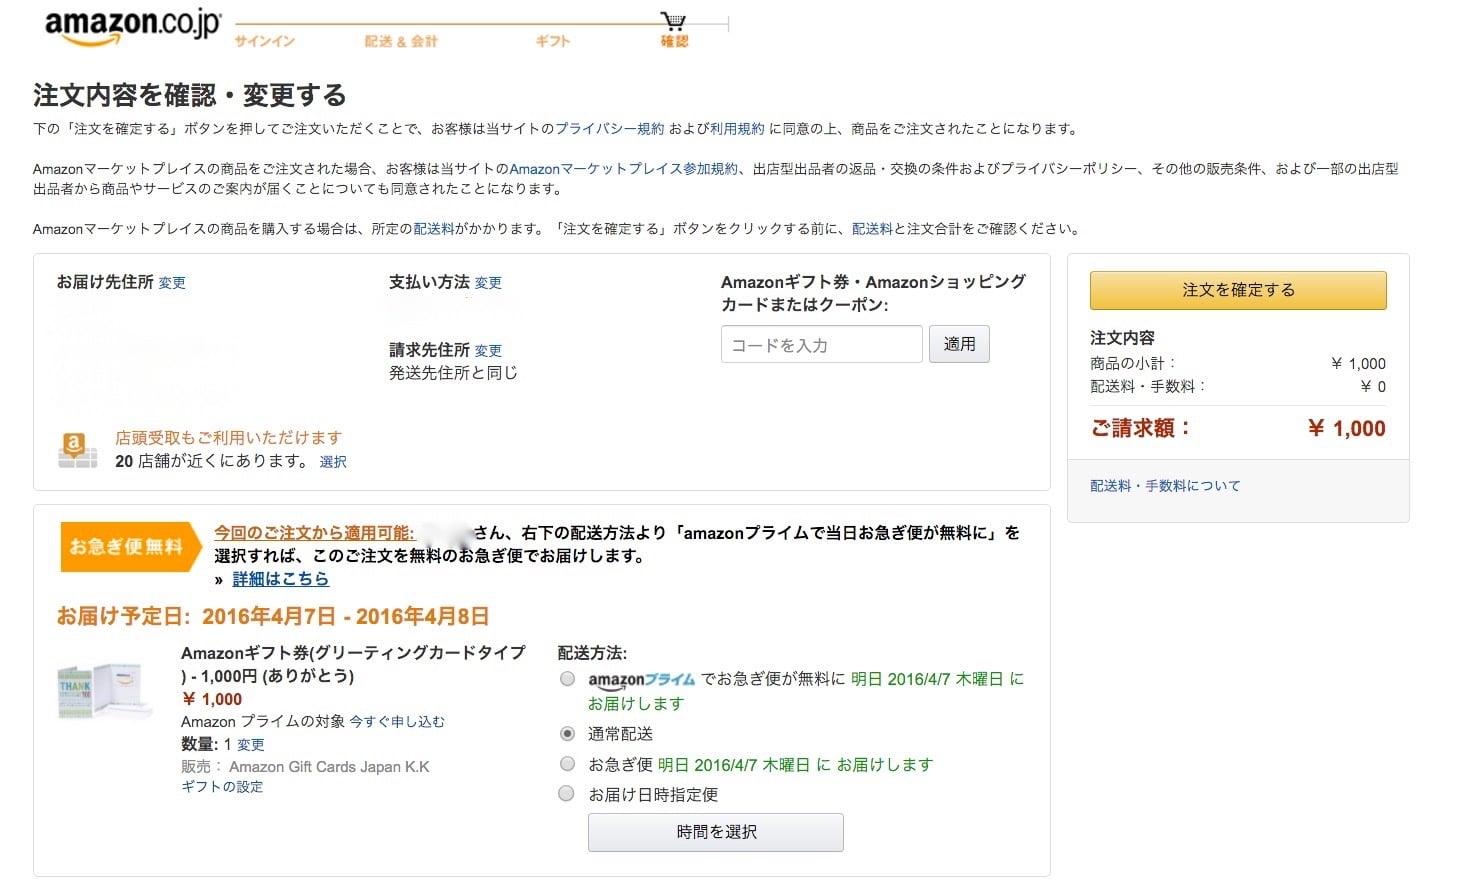 Amazon 送料有料化